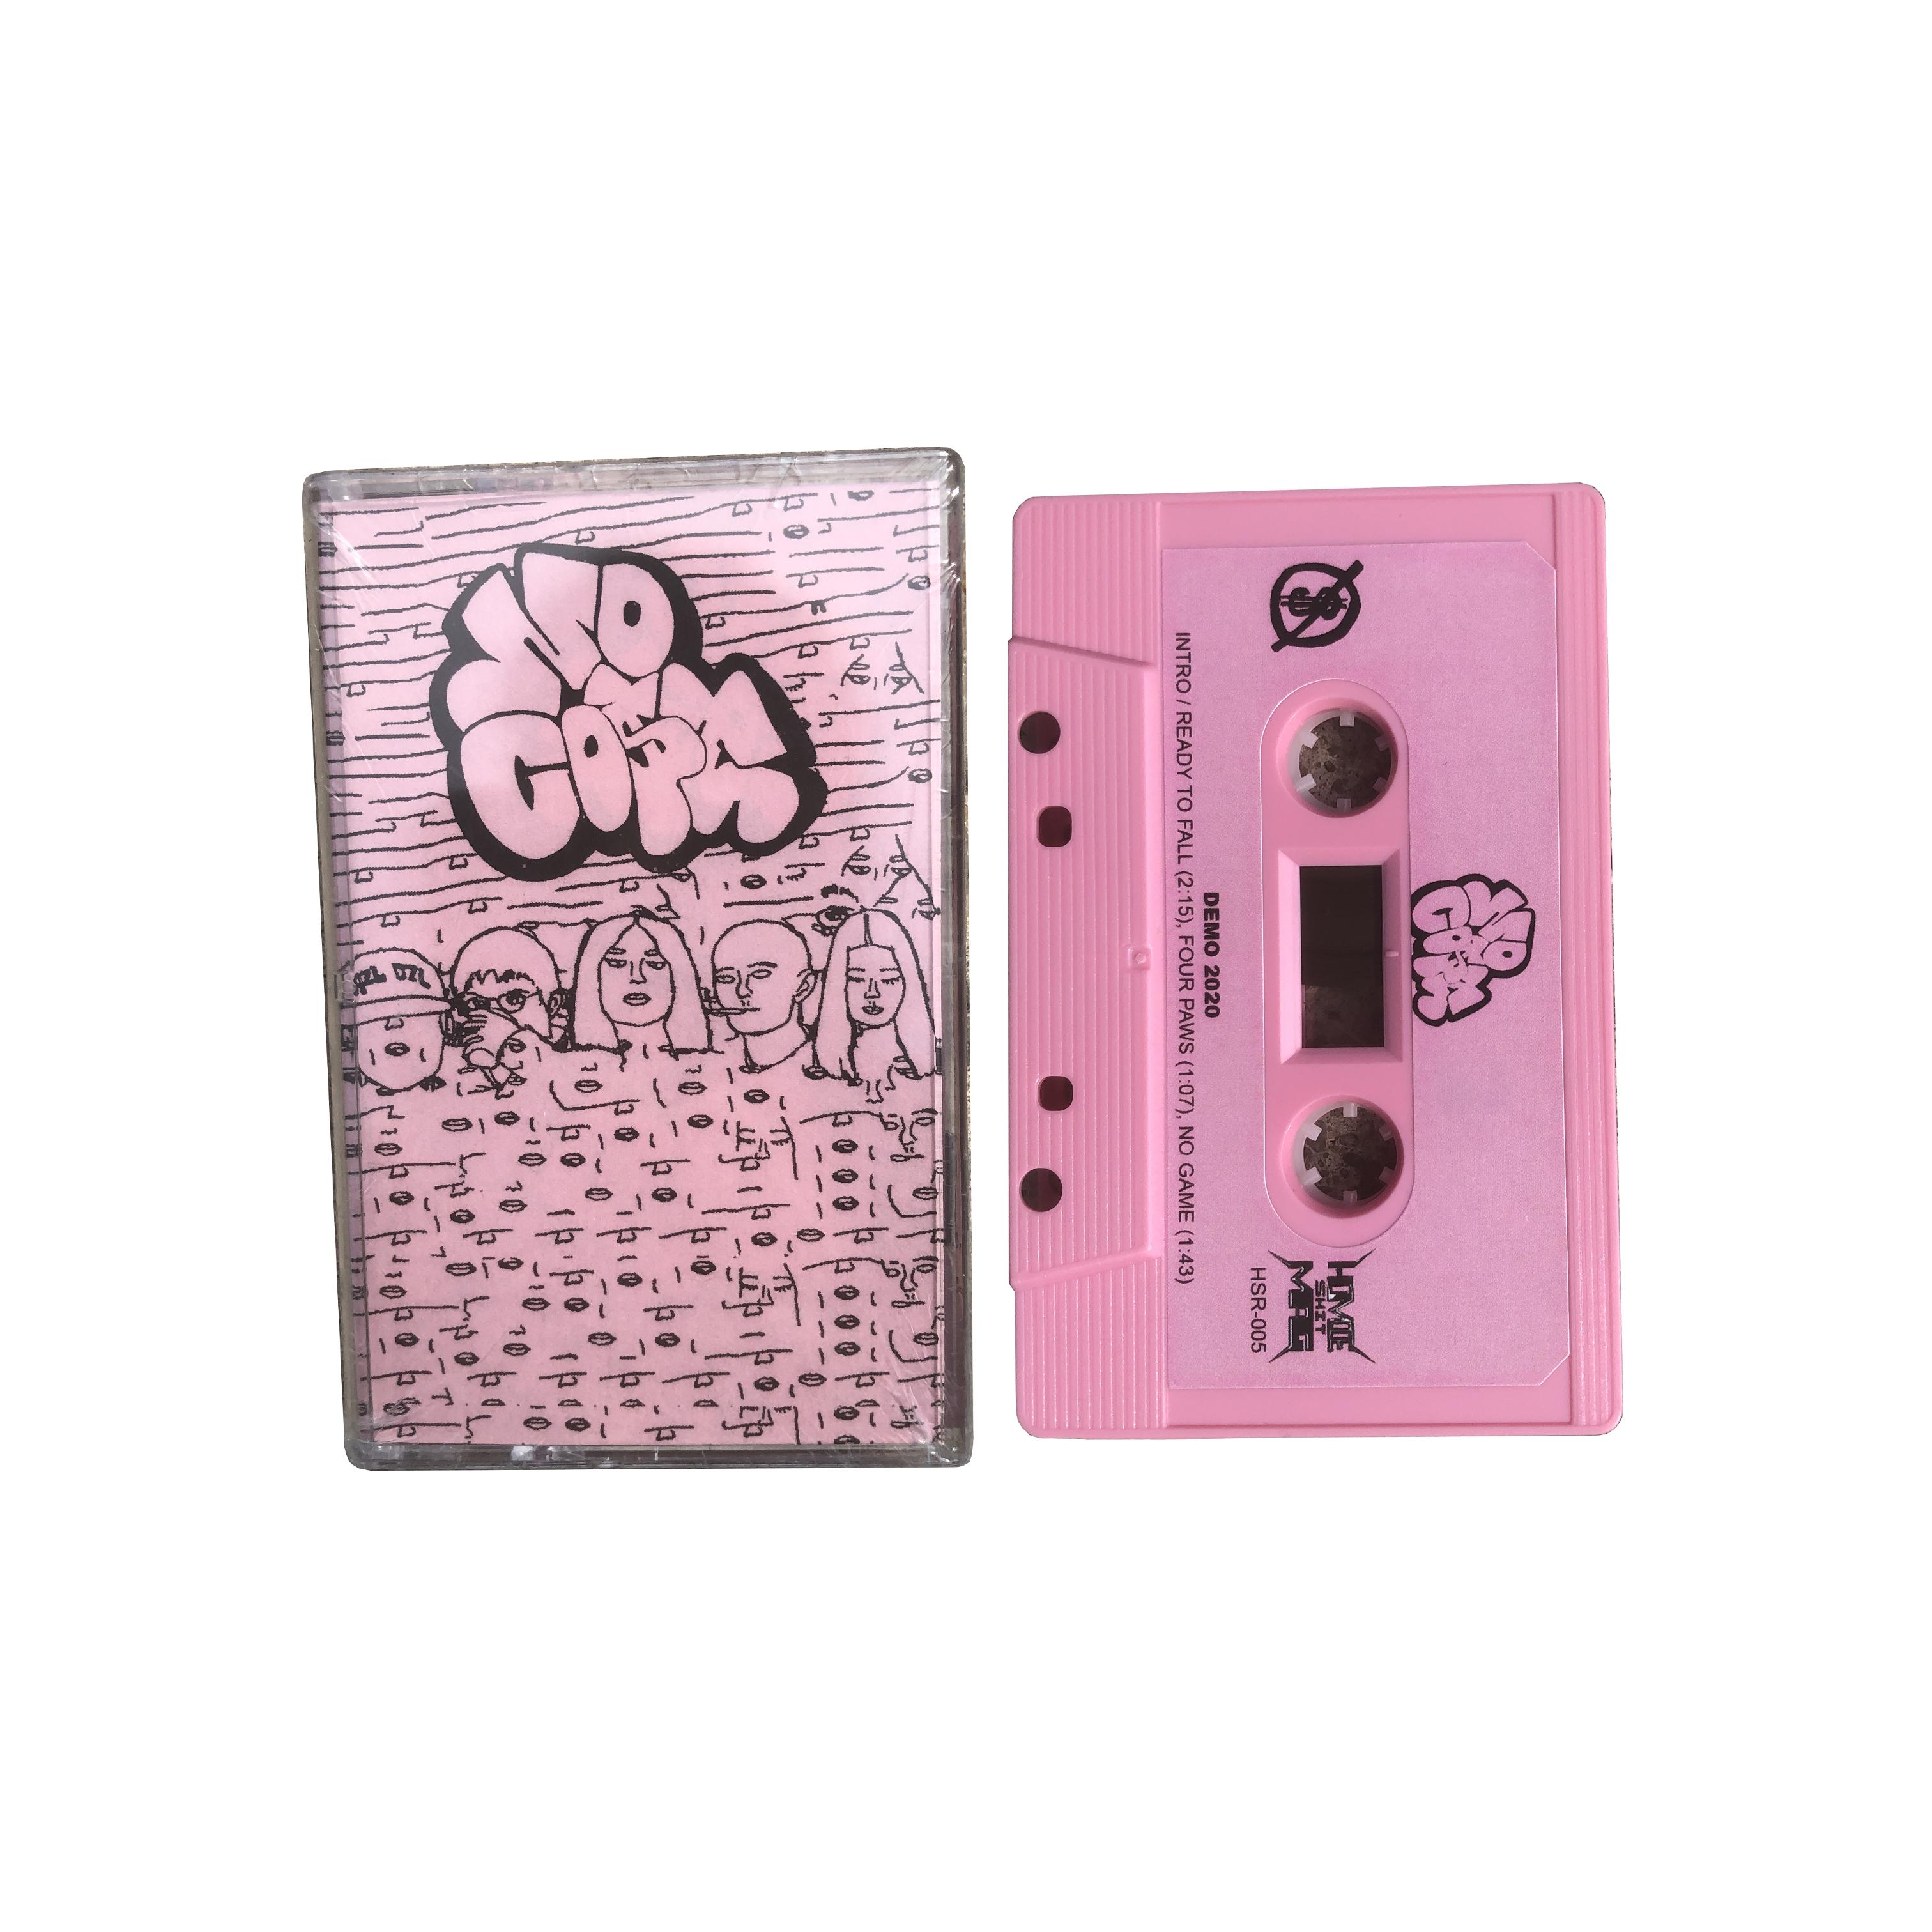 No Co$t - Demo 2020 Cassette